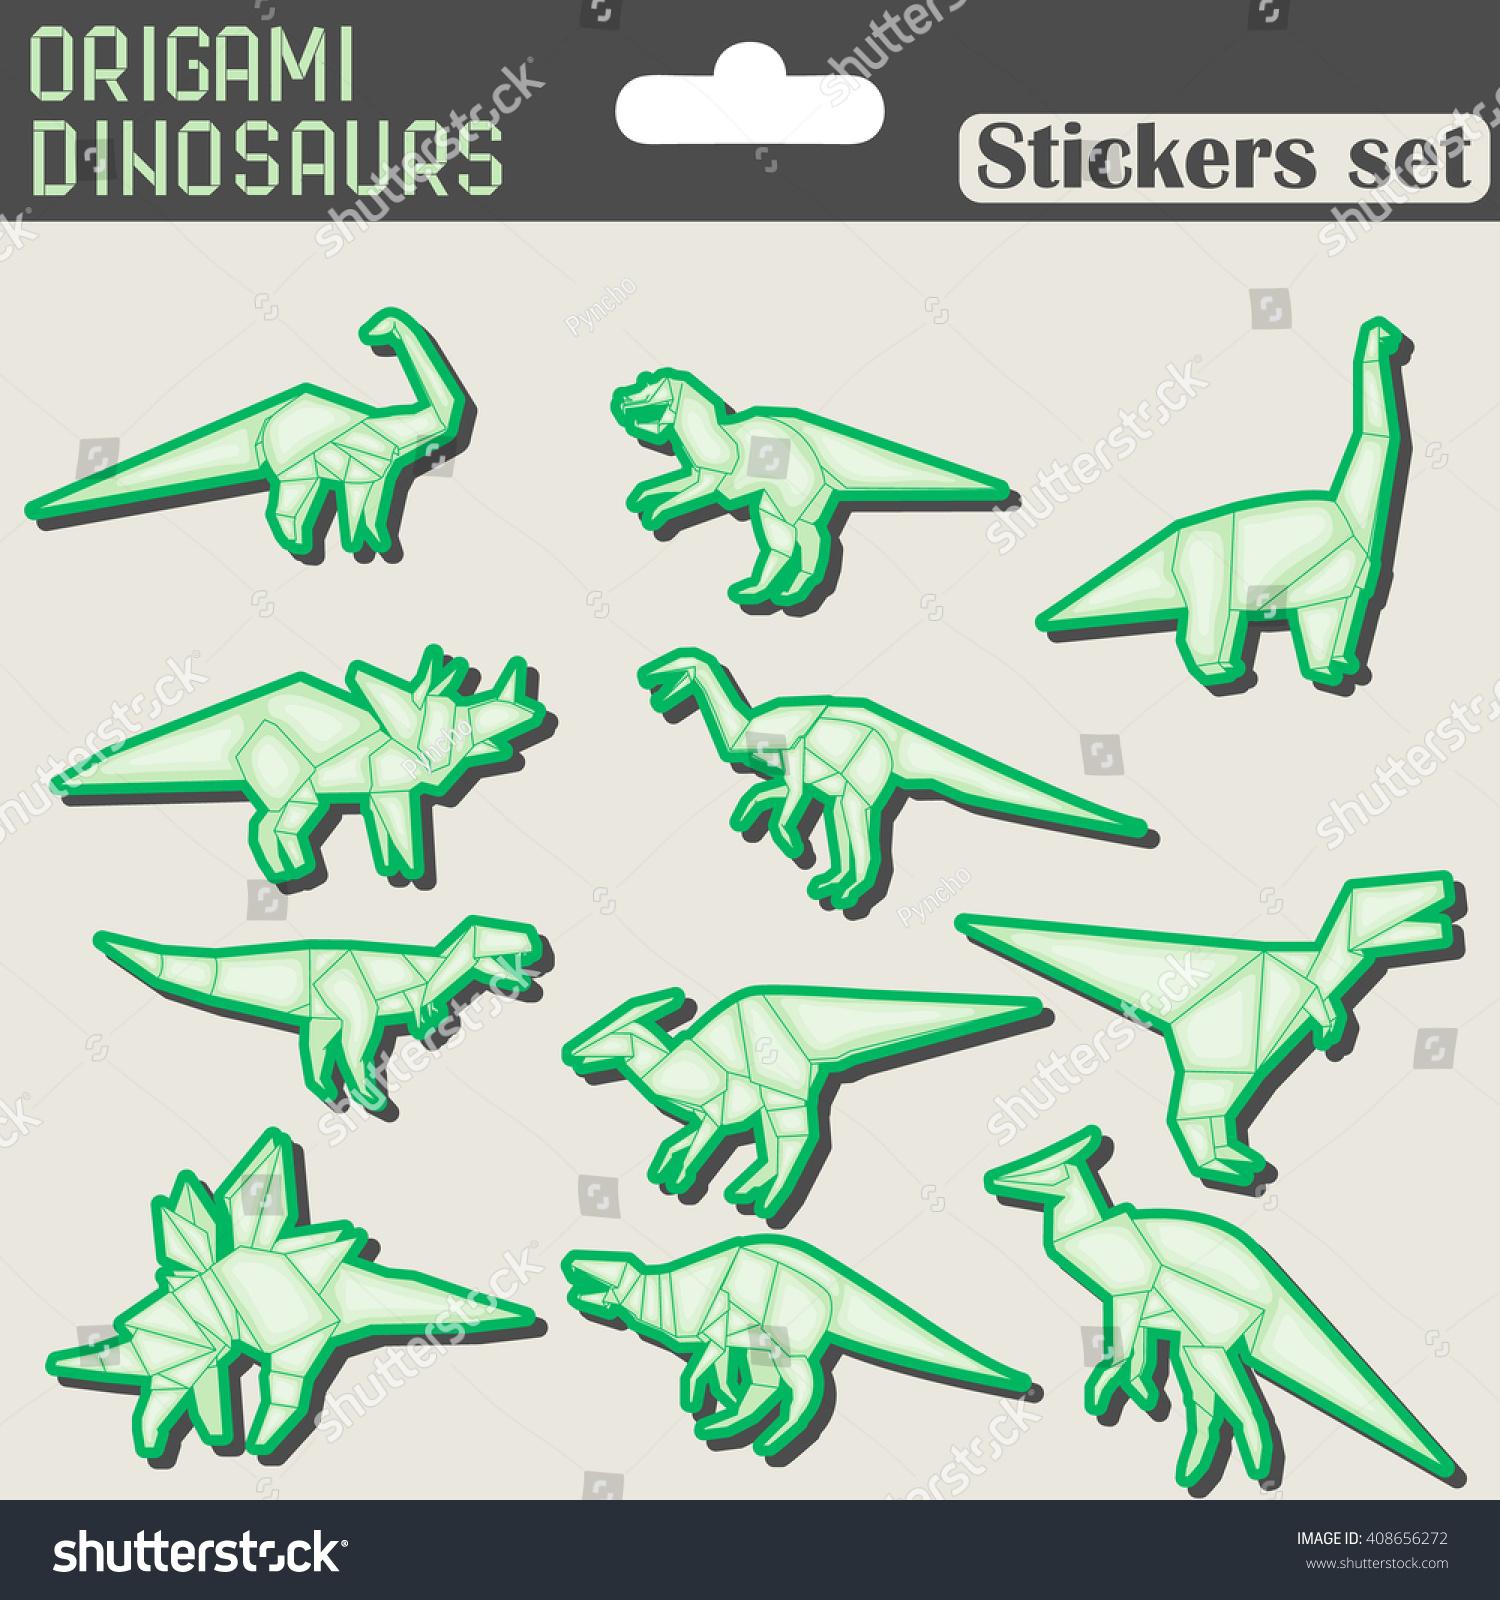 Origami Brontosaurus Dinosaur Tutorial Handmade Dinosaurs A List Of Online Origamidinosaur Diagrams Choice Image Craft Decoration Ideas